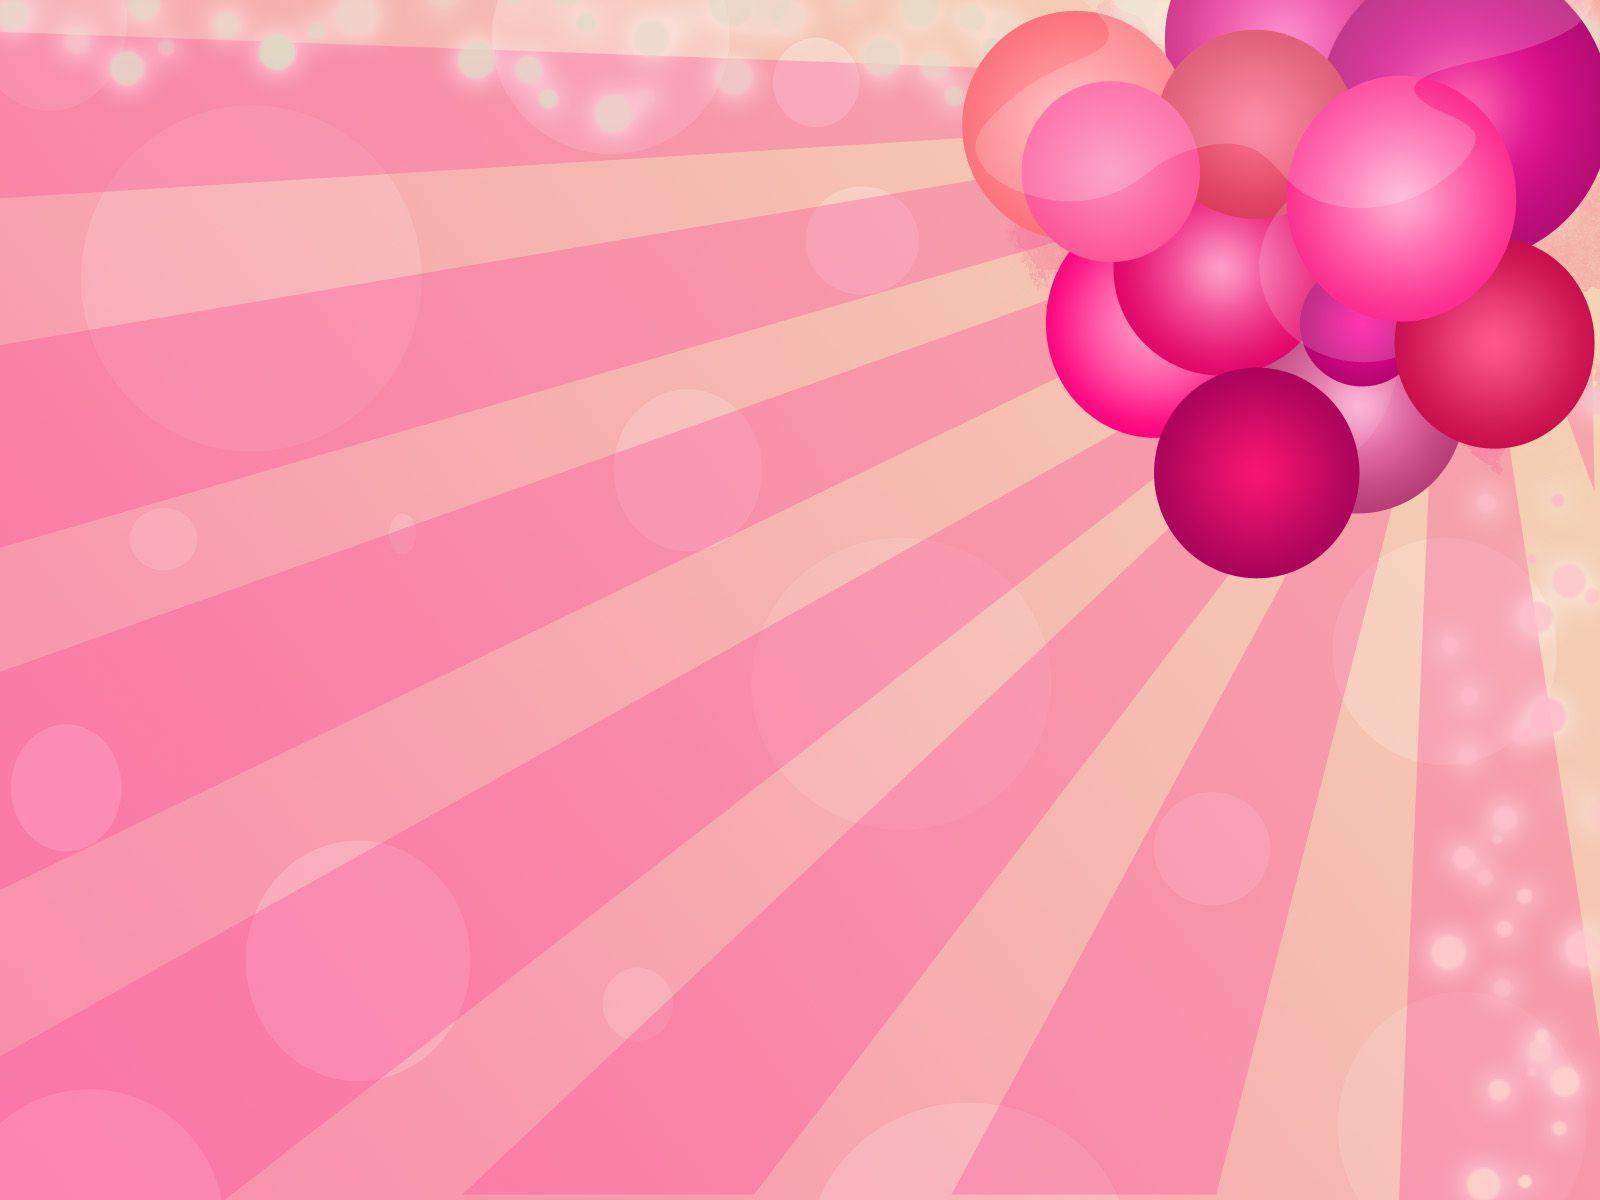 Abstract Pink Ballon Pink Hd Wallpaper Hd Wallpapers Source Pink Wallpaper Backgrounds Pink Wallpaper Cute Wallpapers